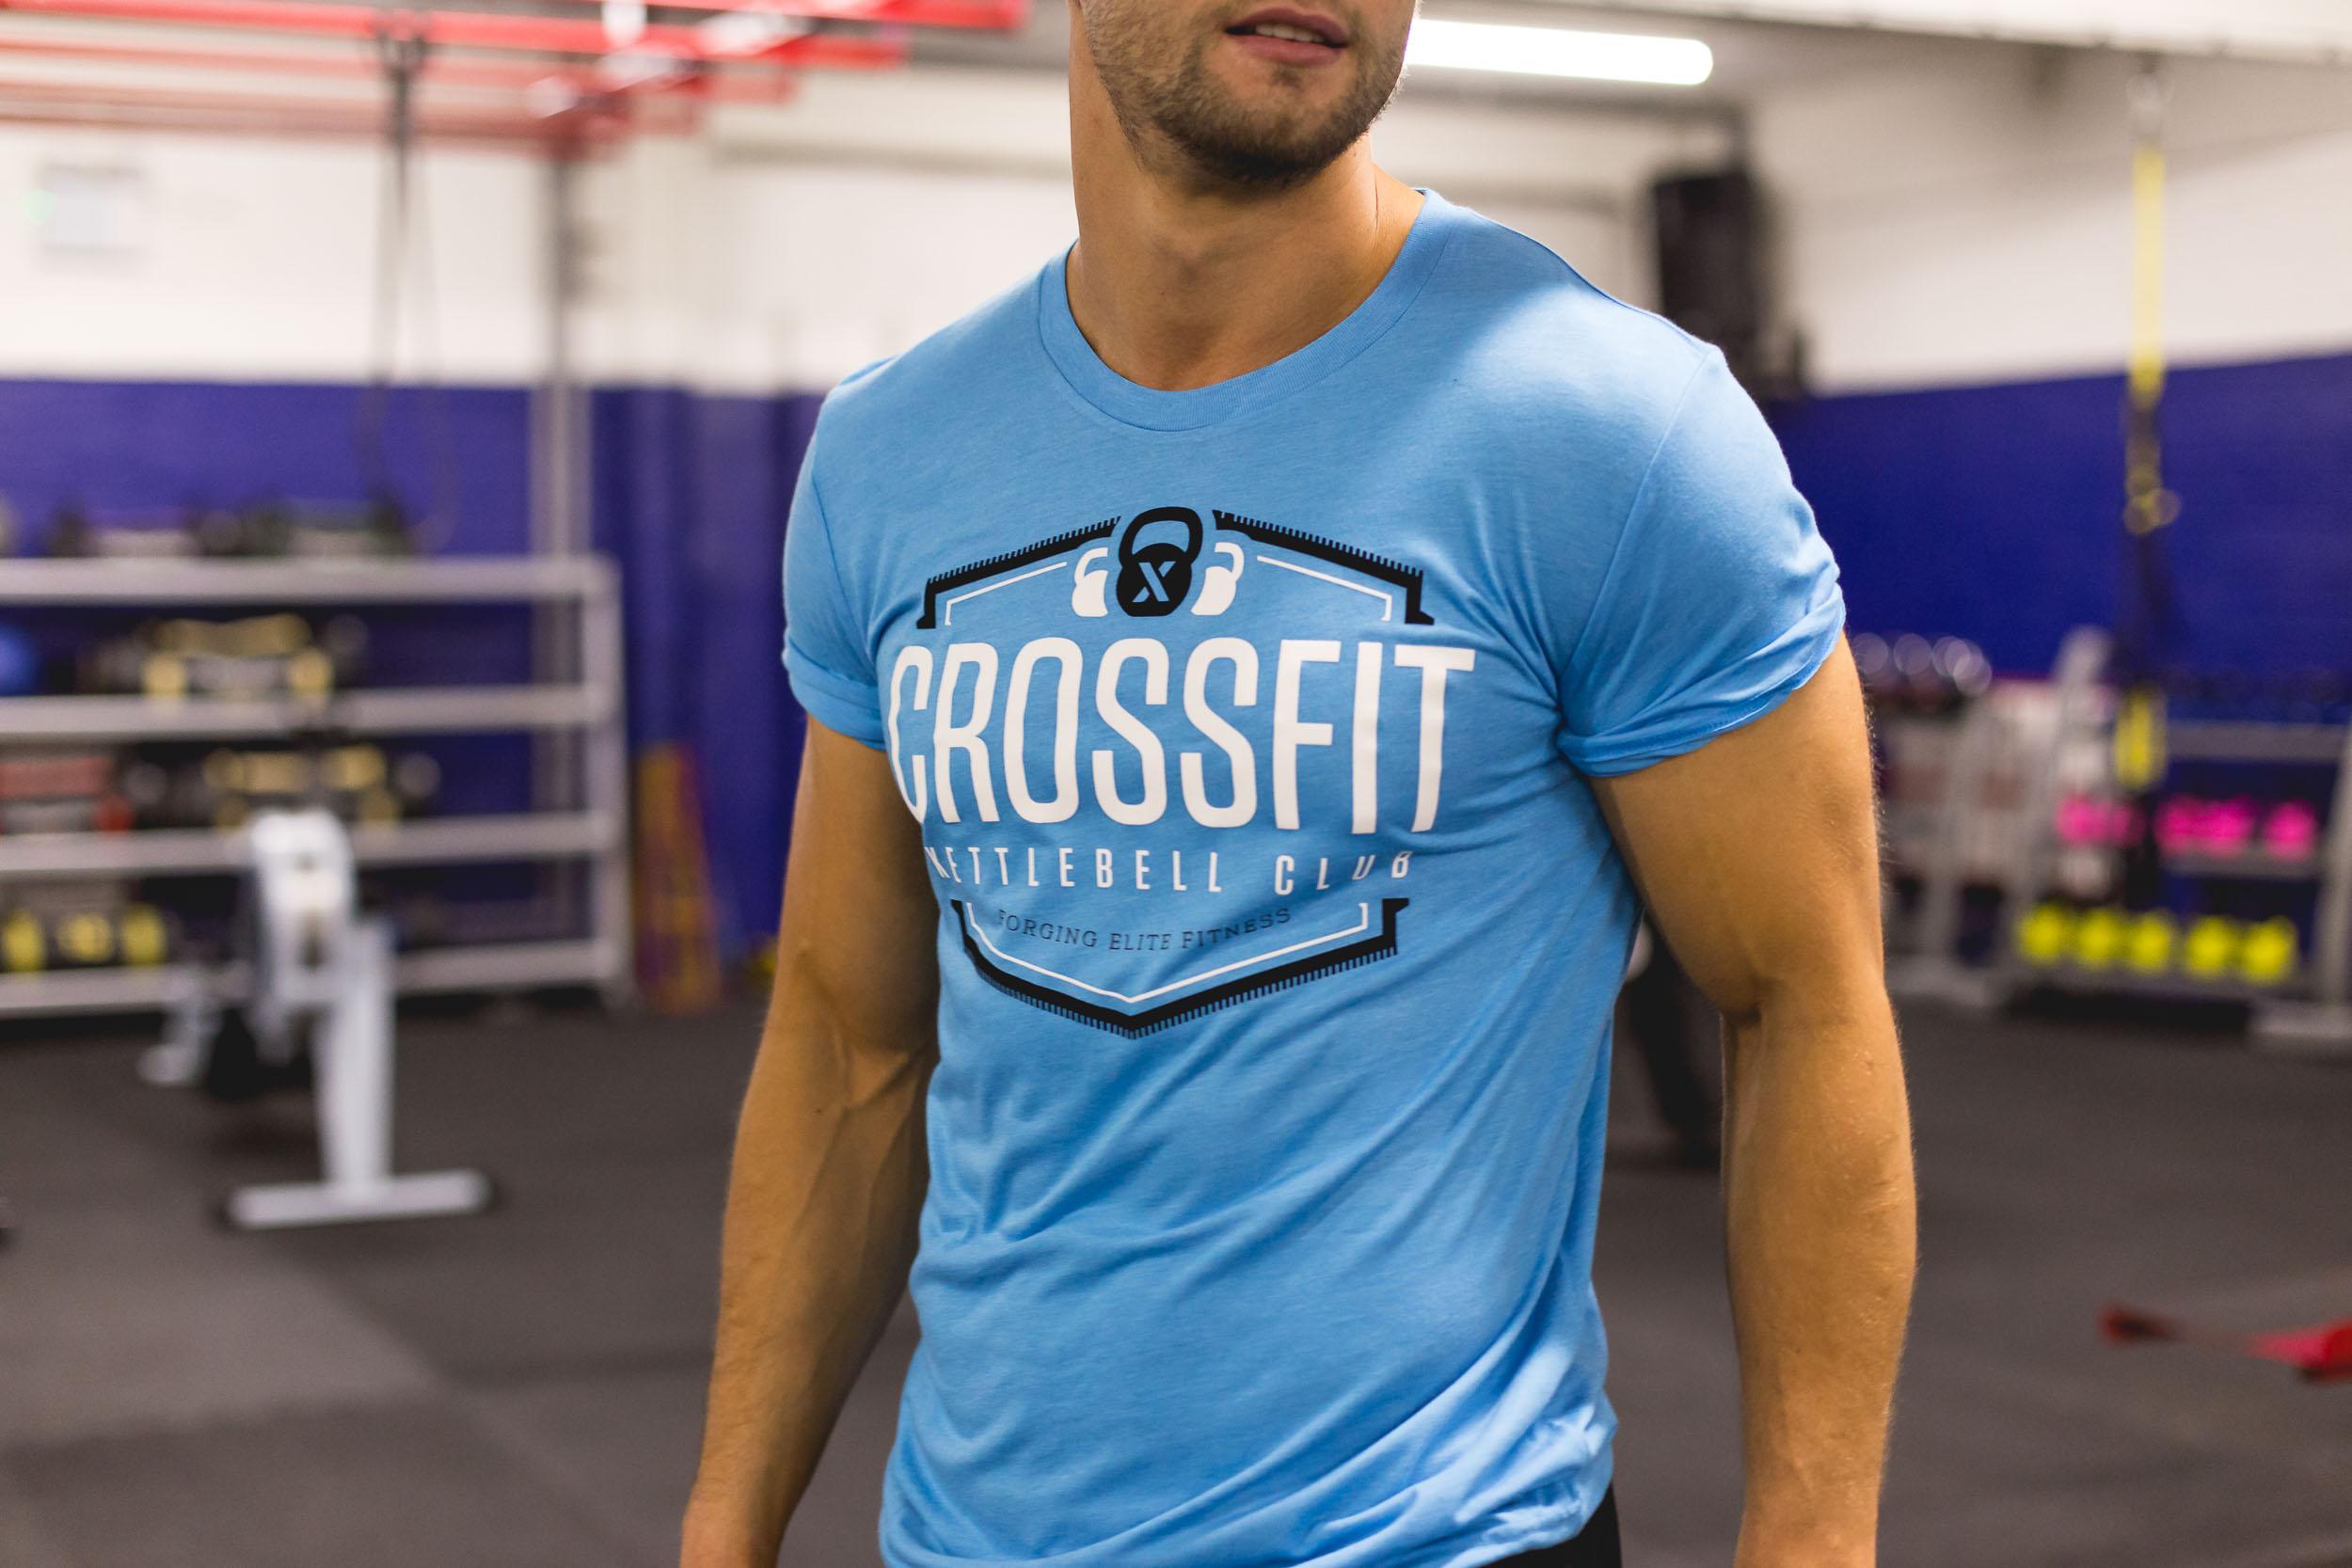 Crossfit UK printed clothing t-shirts-9233.jpg